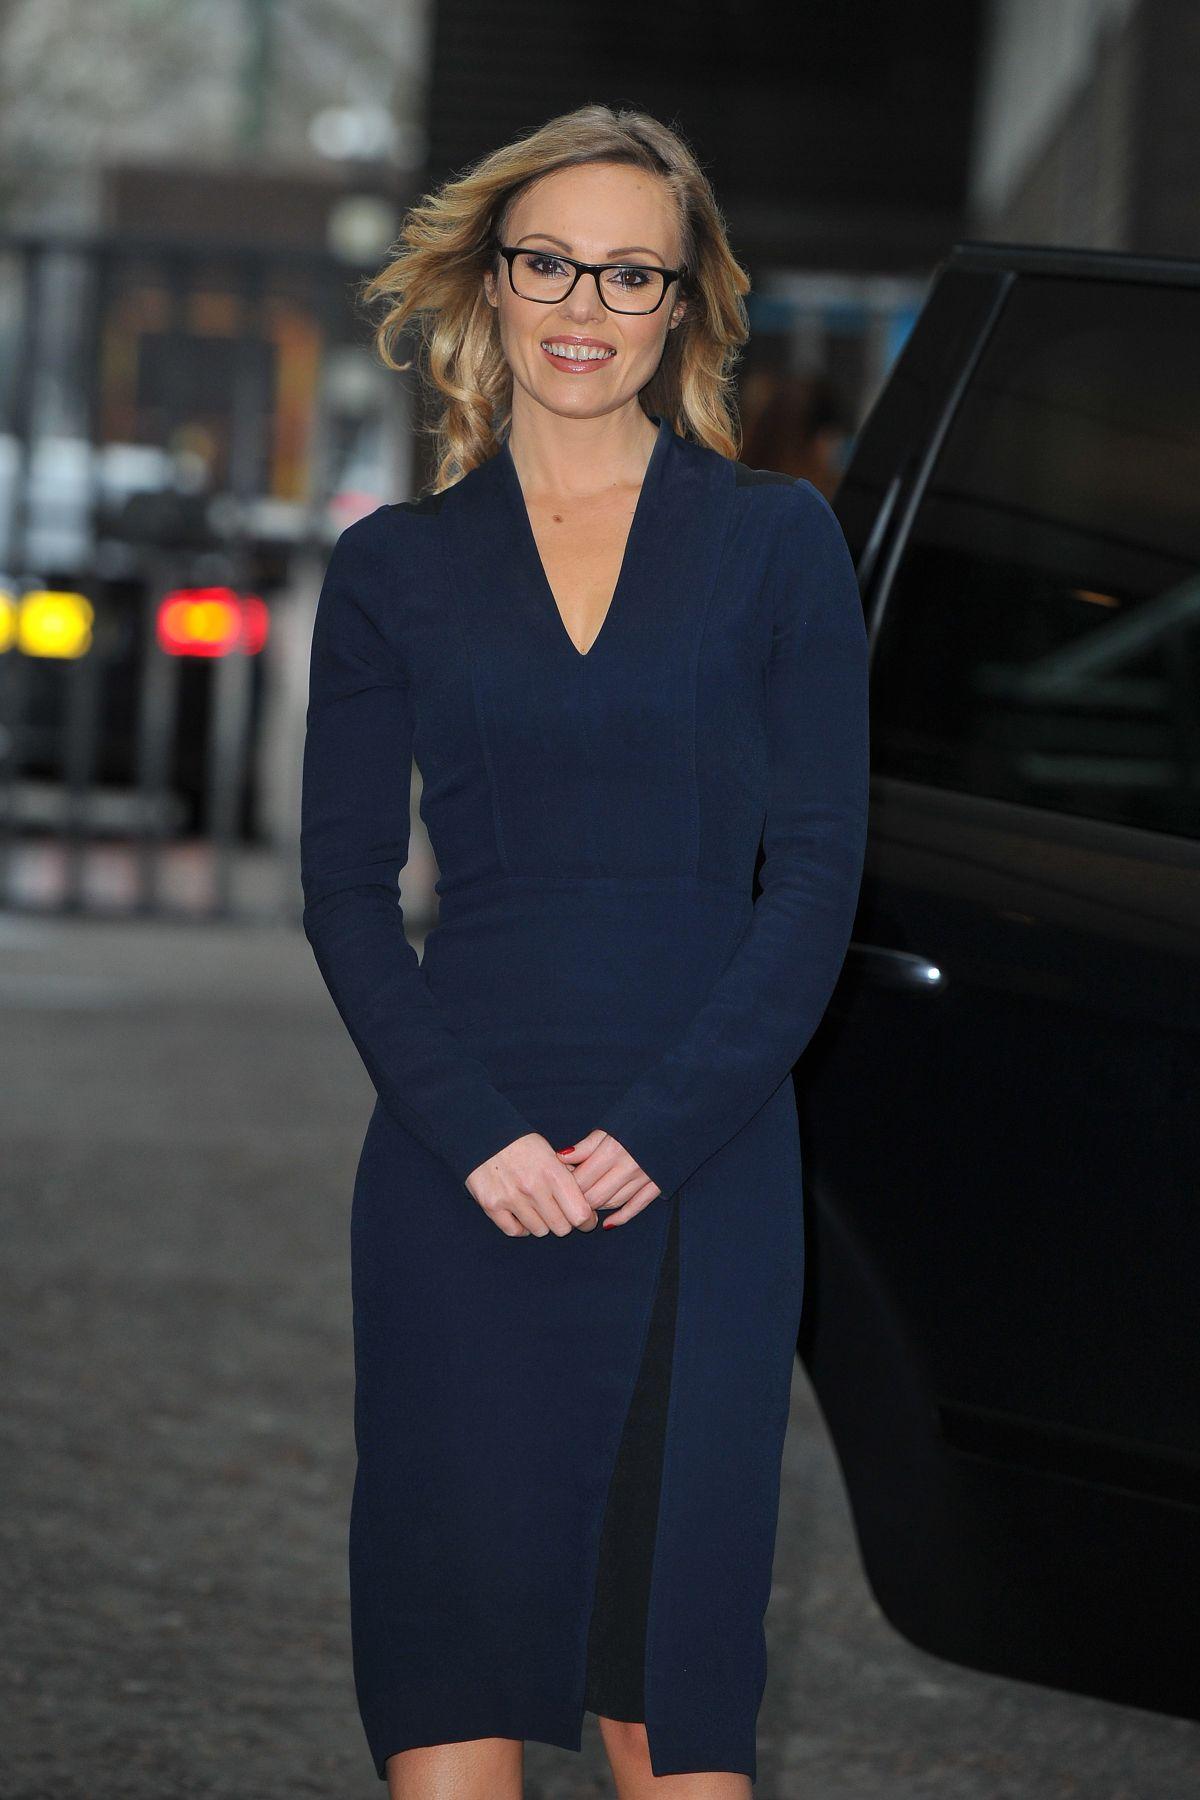 MICHELLE DEWBERRY at ITV Studios in London 02/21/2017